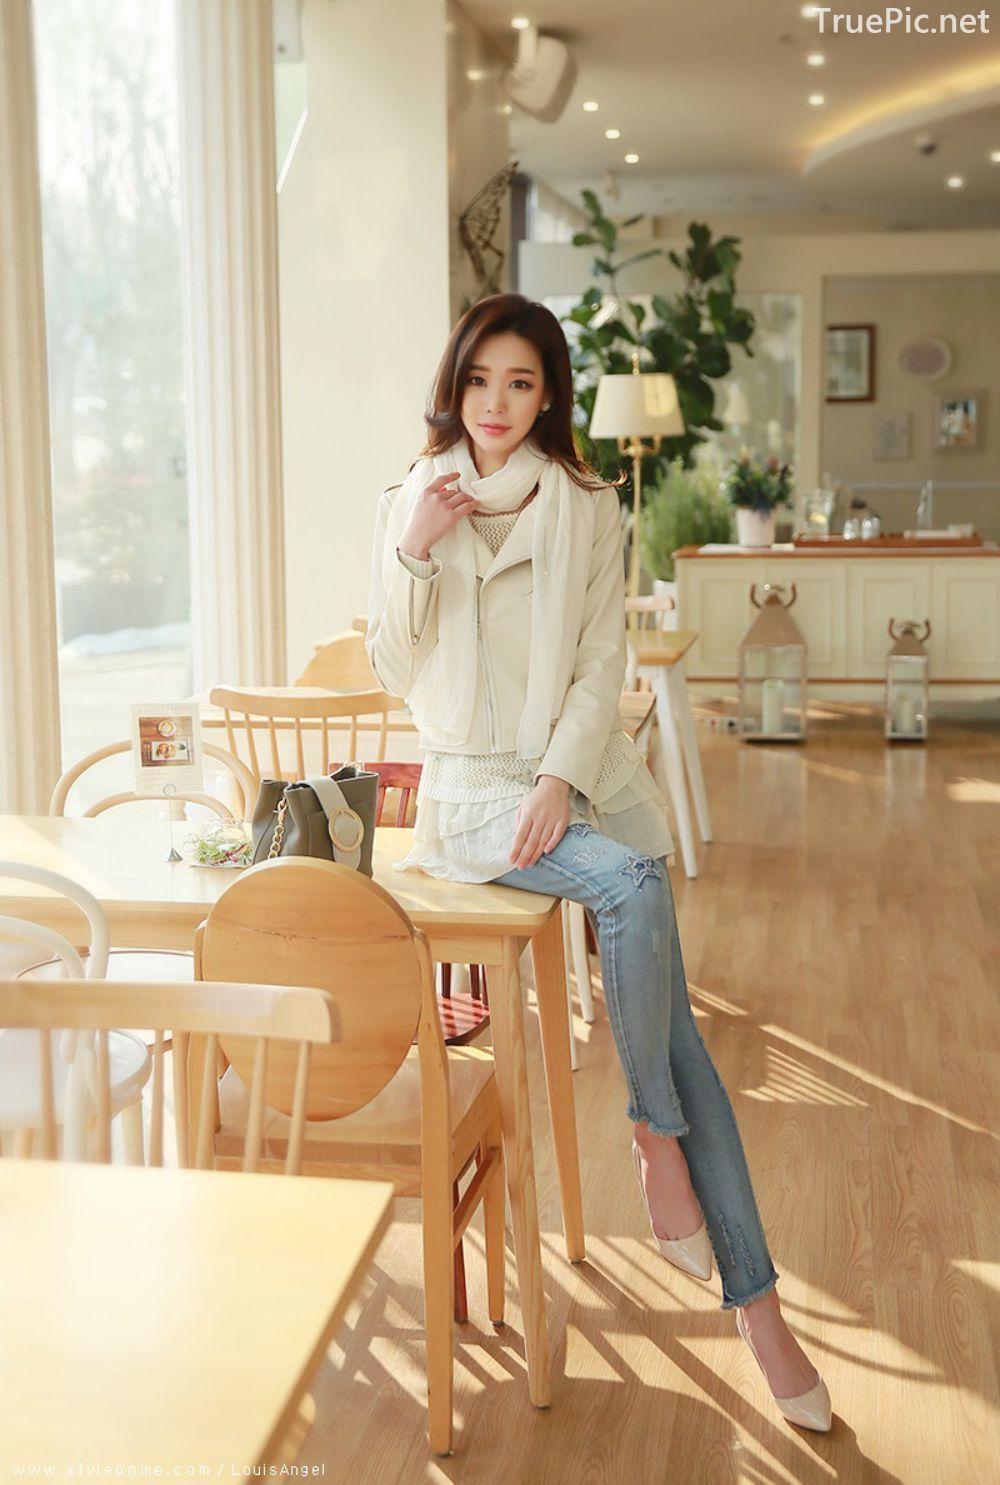 Korean Fashion Model - Park Da Hyun - Indoor Photoshoot Collection - TruePic.net - Picture 8